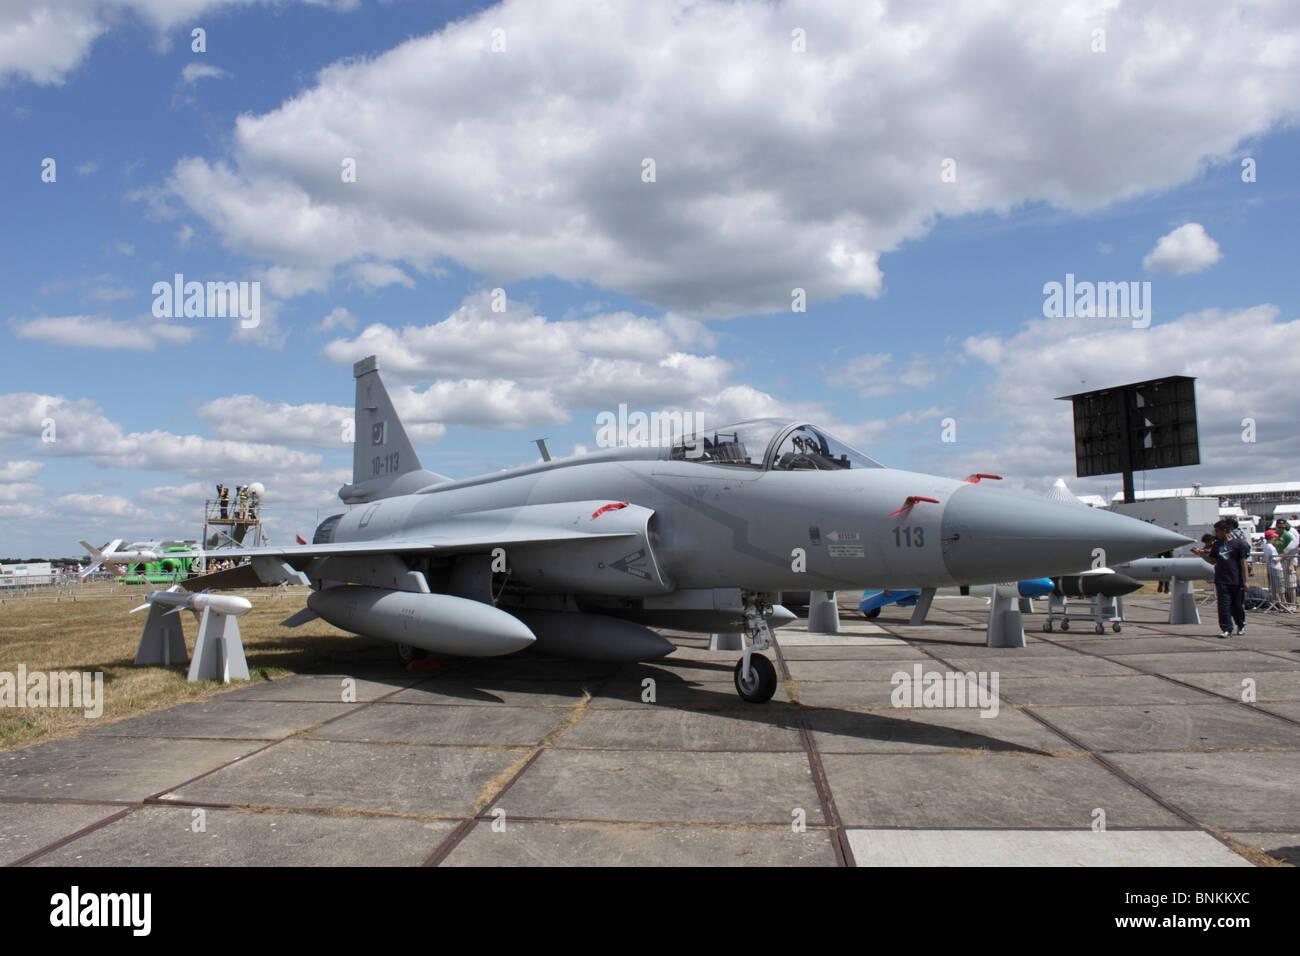 Jf 17 Thunder Fighter Jet Pakistan Stock Photos & Jf 17